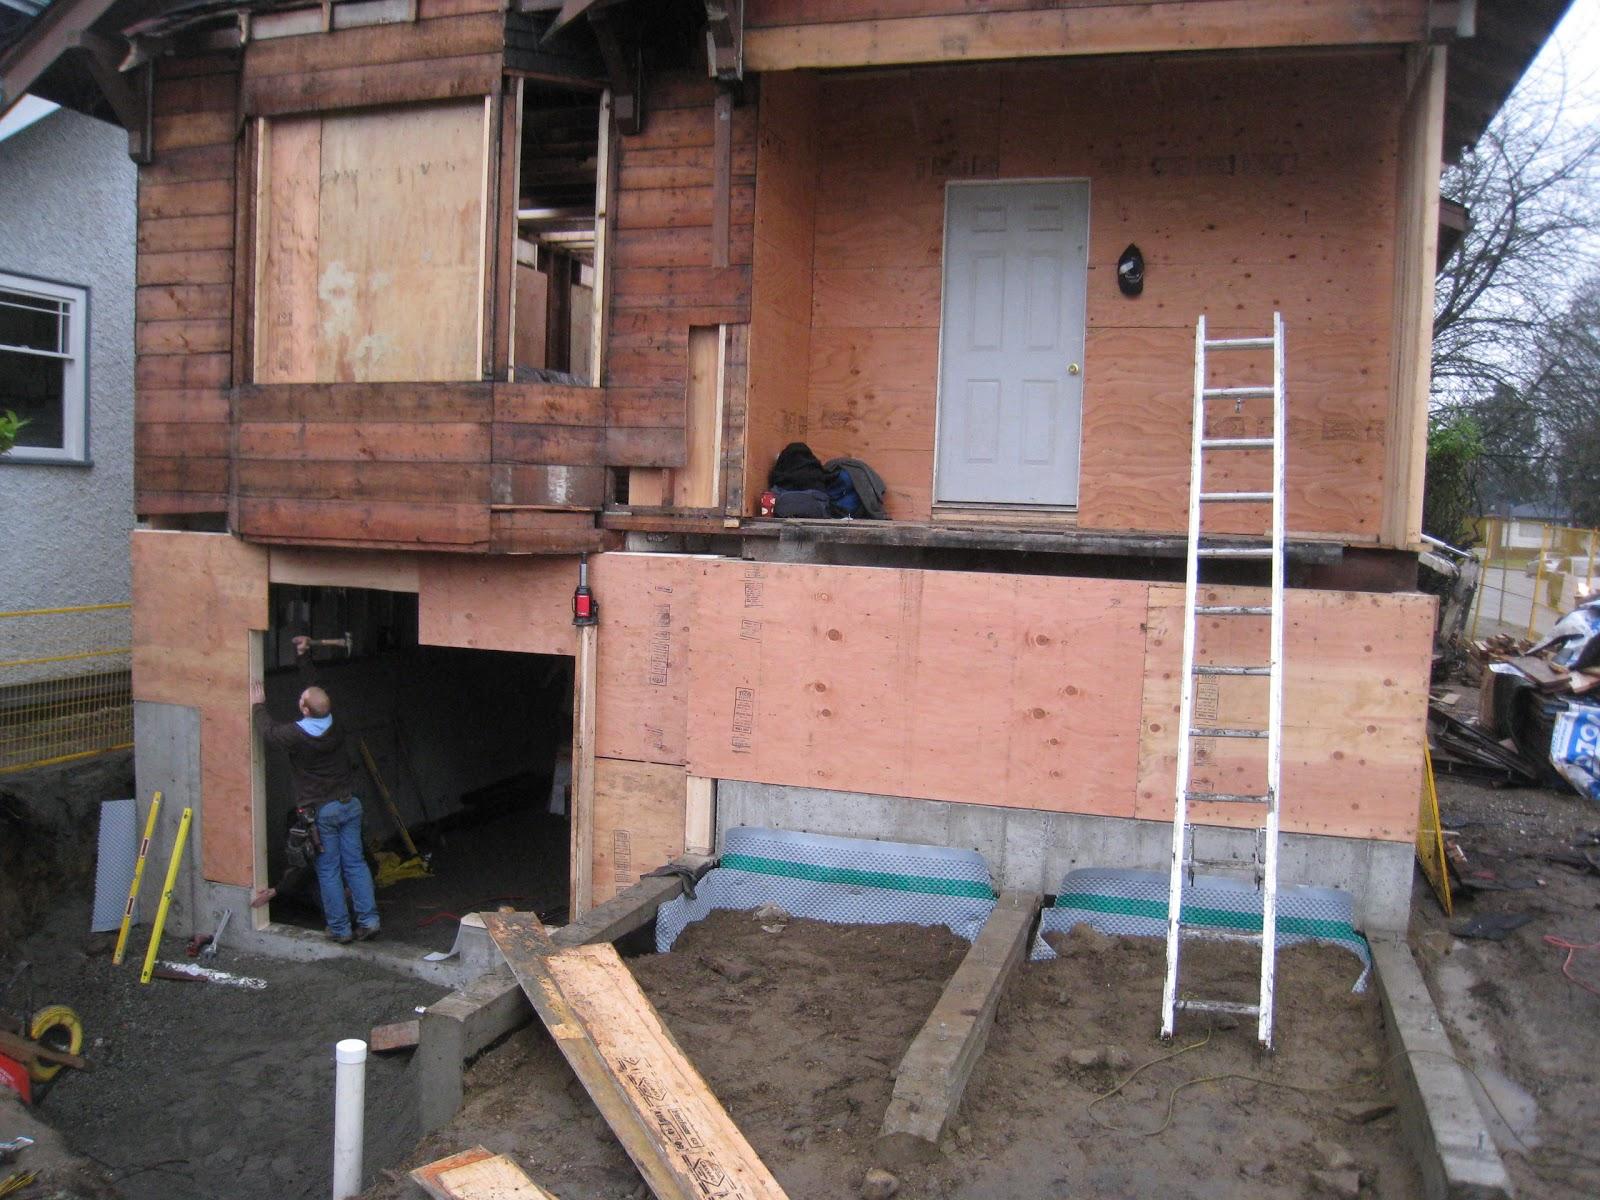 drainage mat installed backfill complete backframing begins